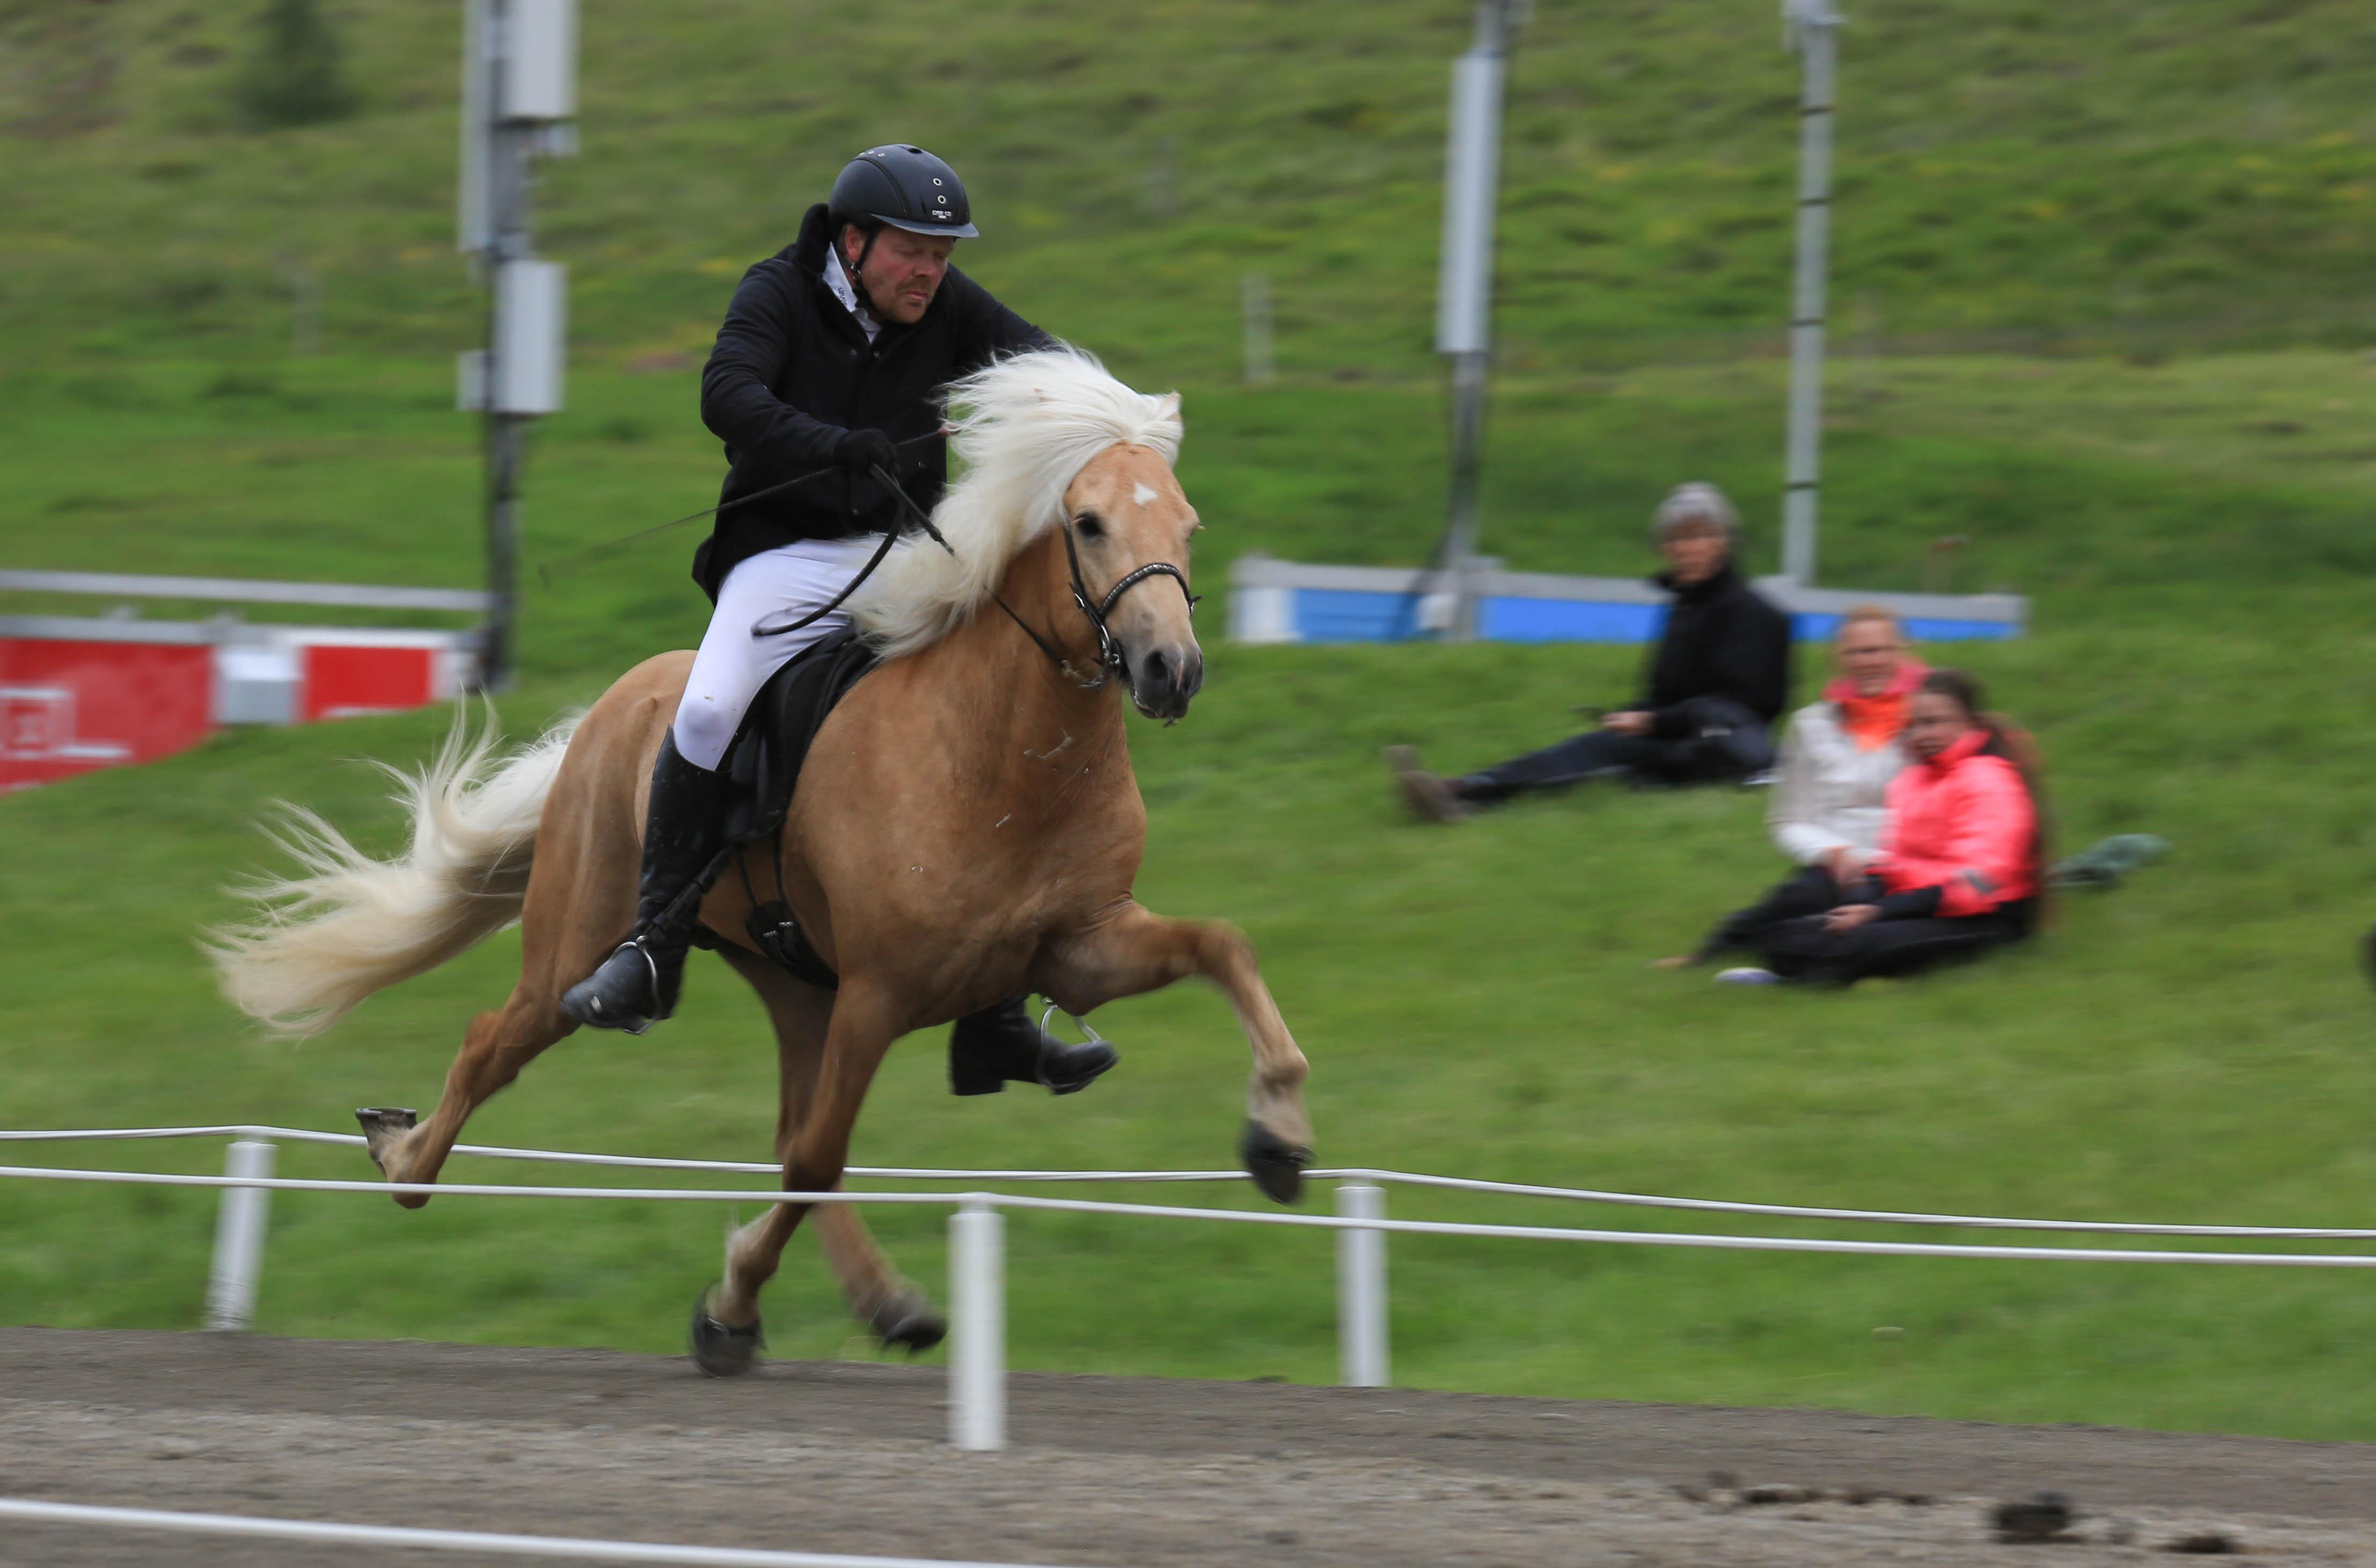 9.0 för pass – Draupnir frá Stuðlum och Daniel Jónsson Foto:Yvonne Benzian Ishestnews.se